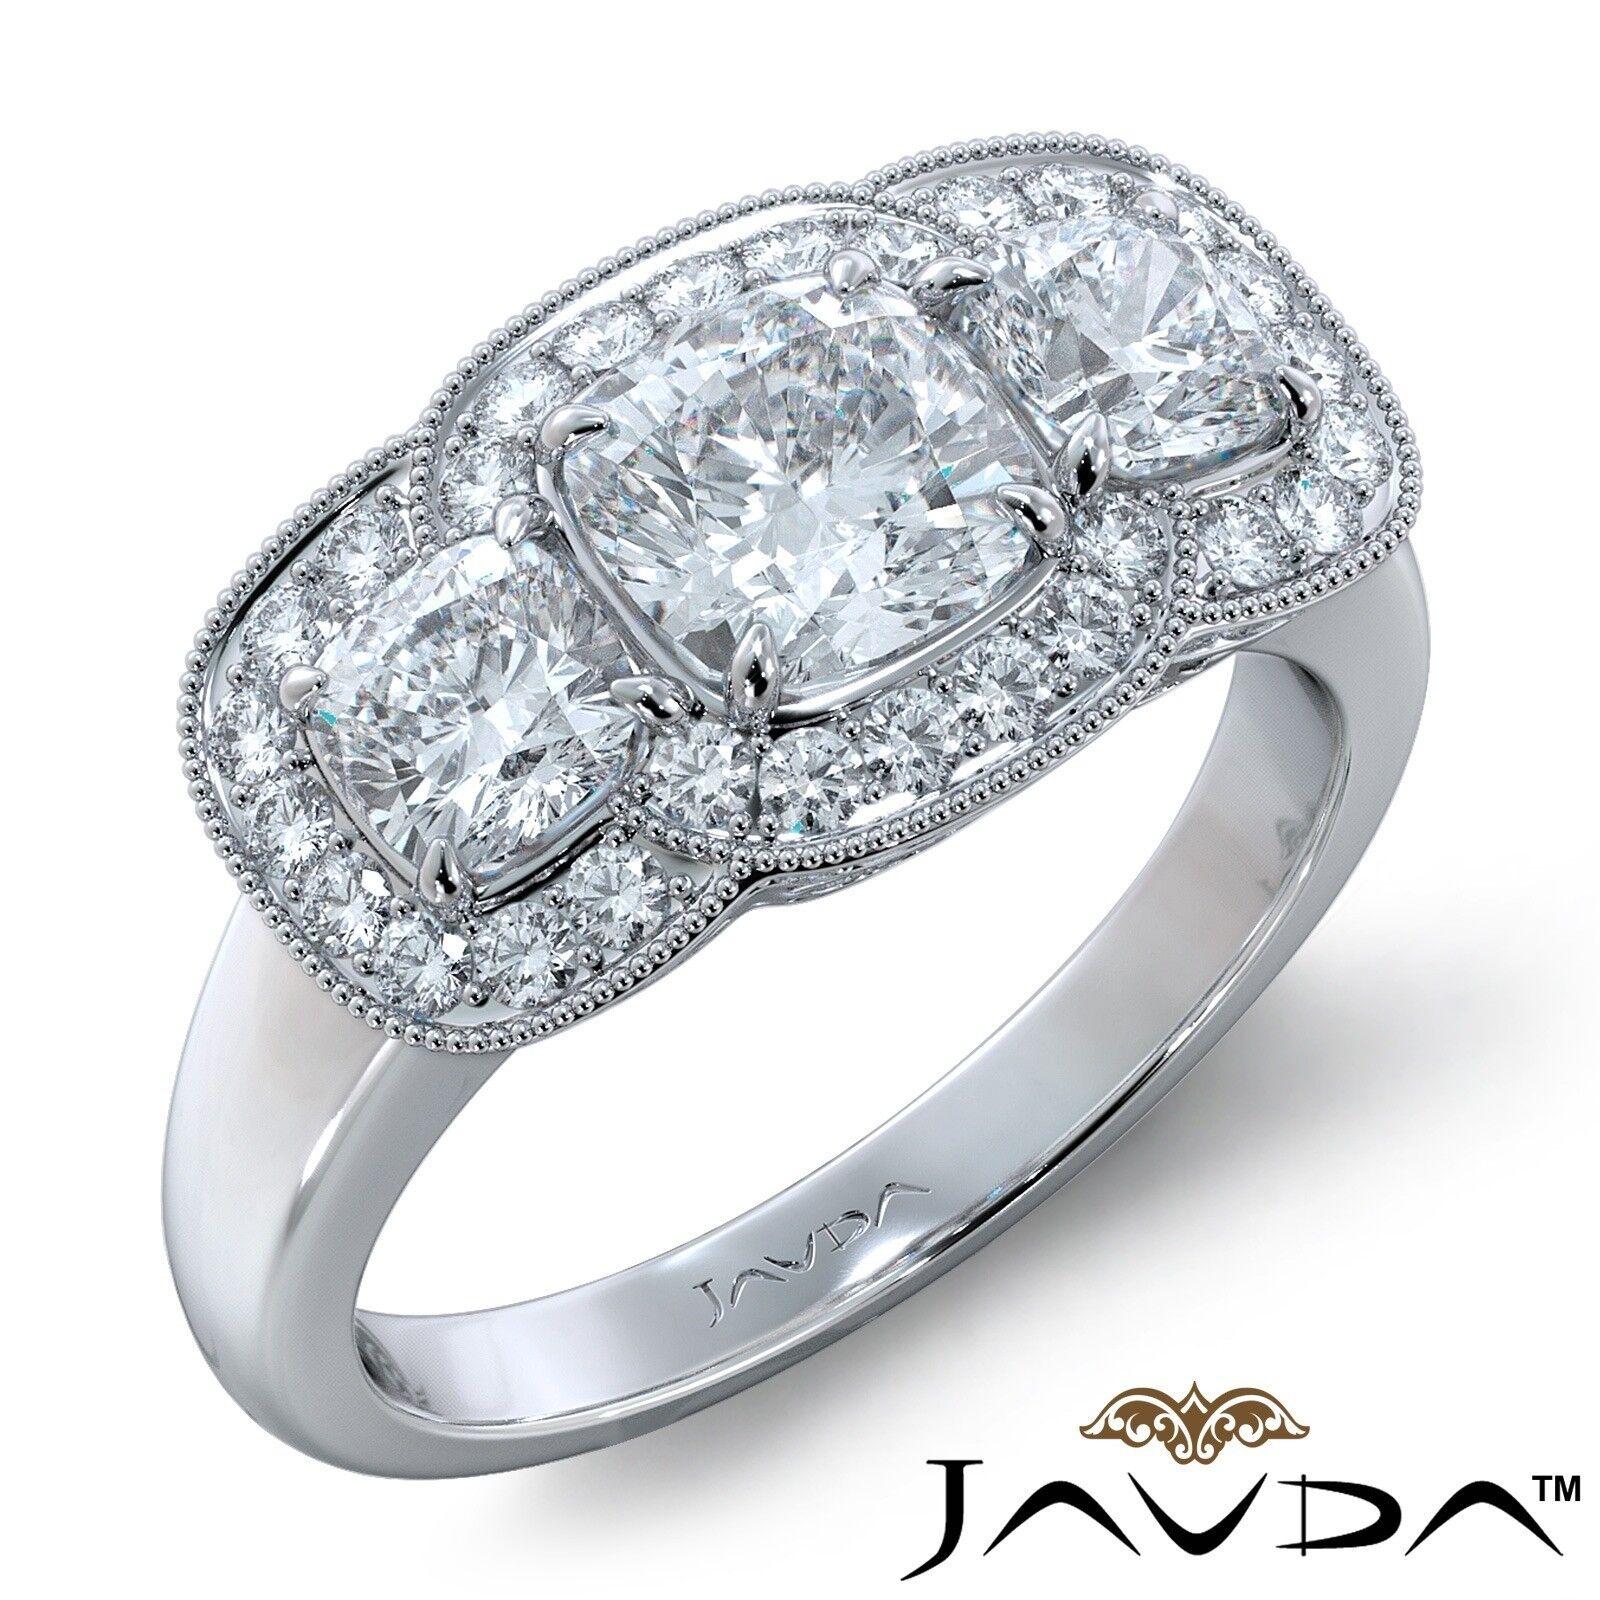 2.06ctw Milgrain Halo 3 Stone Cushion Diamond Engagement Ring GIA K-VS2 W Gold